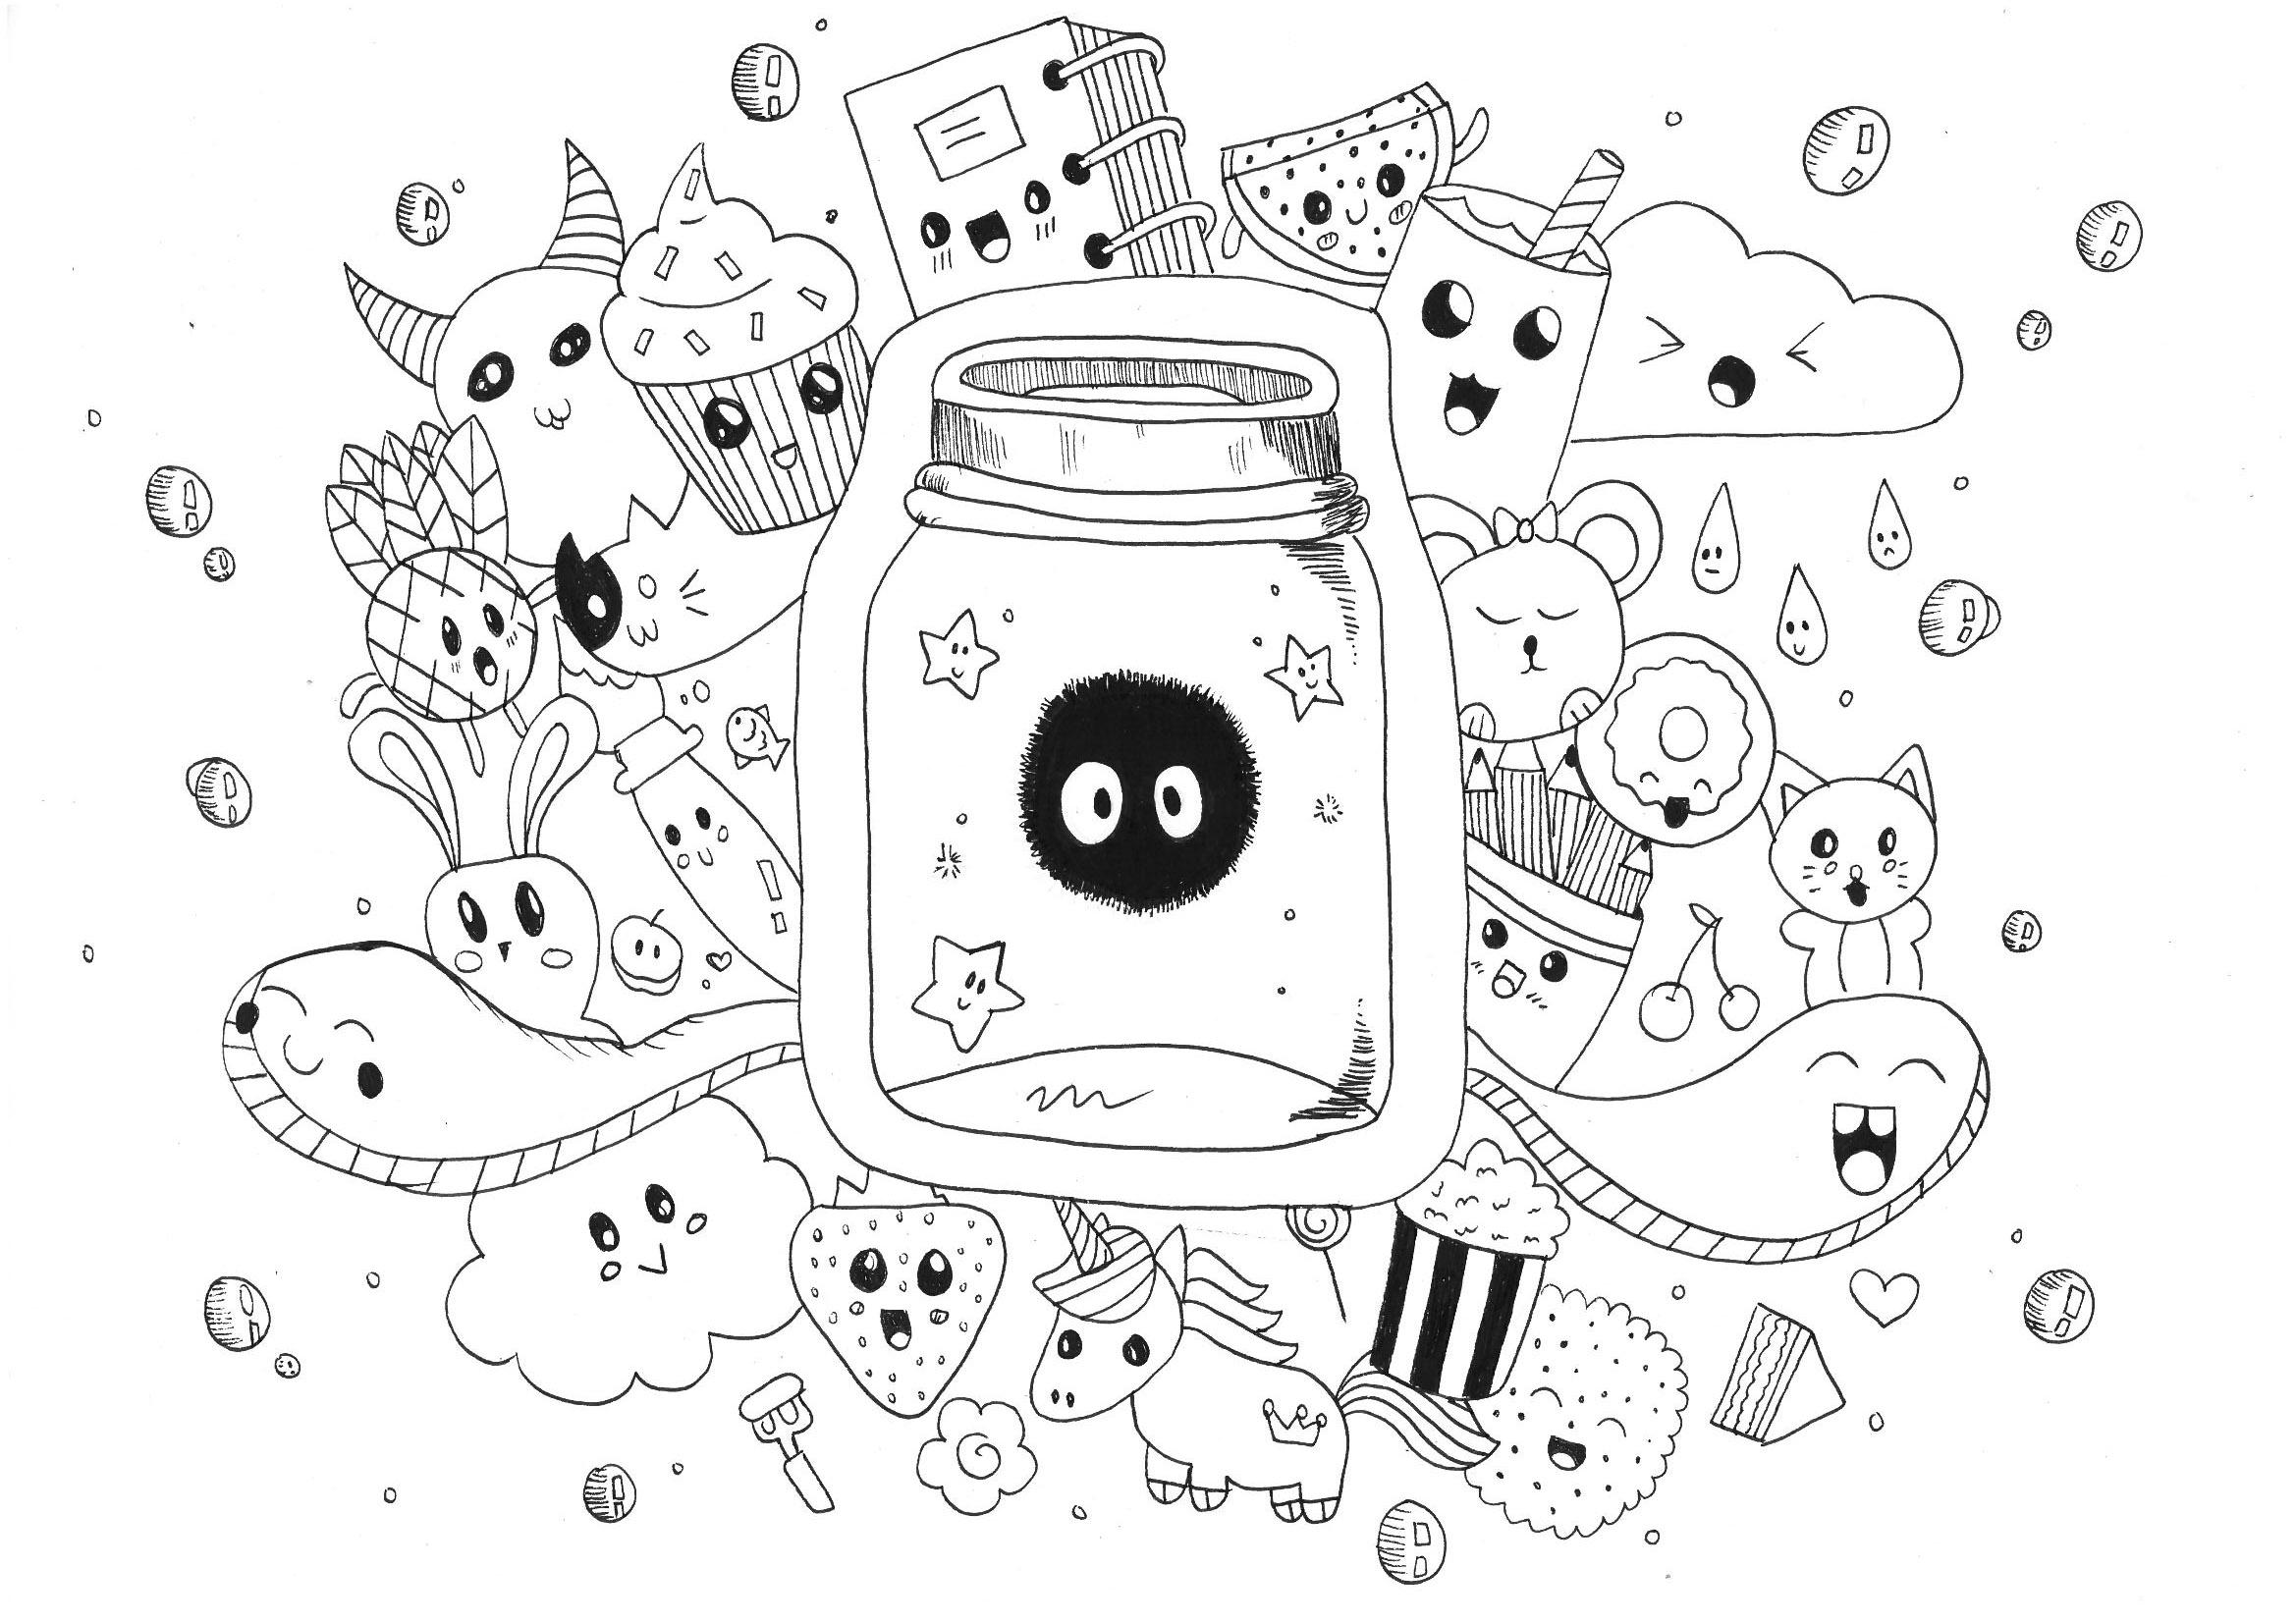 Kawaii Doodle Rachel Doodling Doodle Art Coloring Pages For